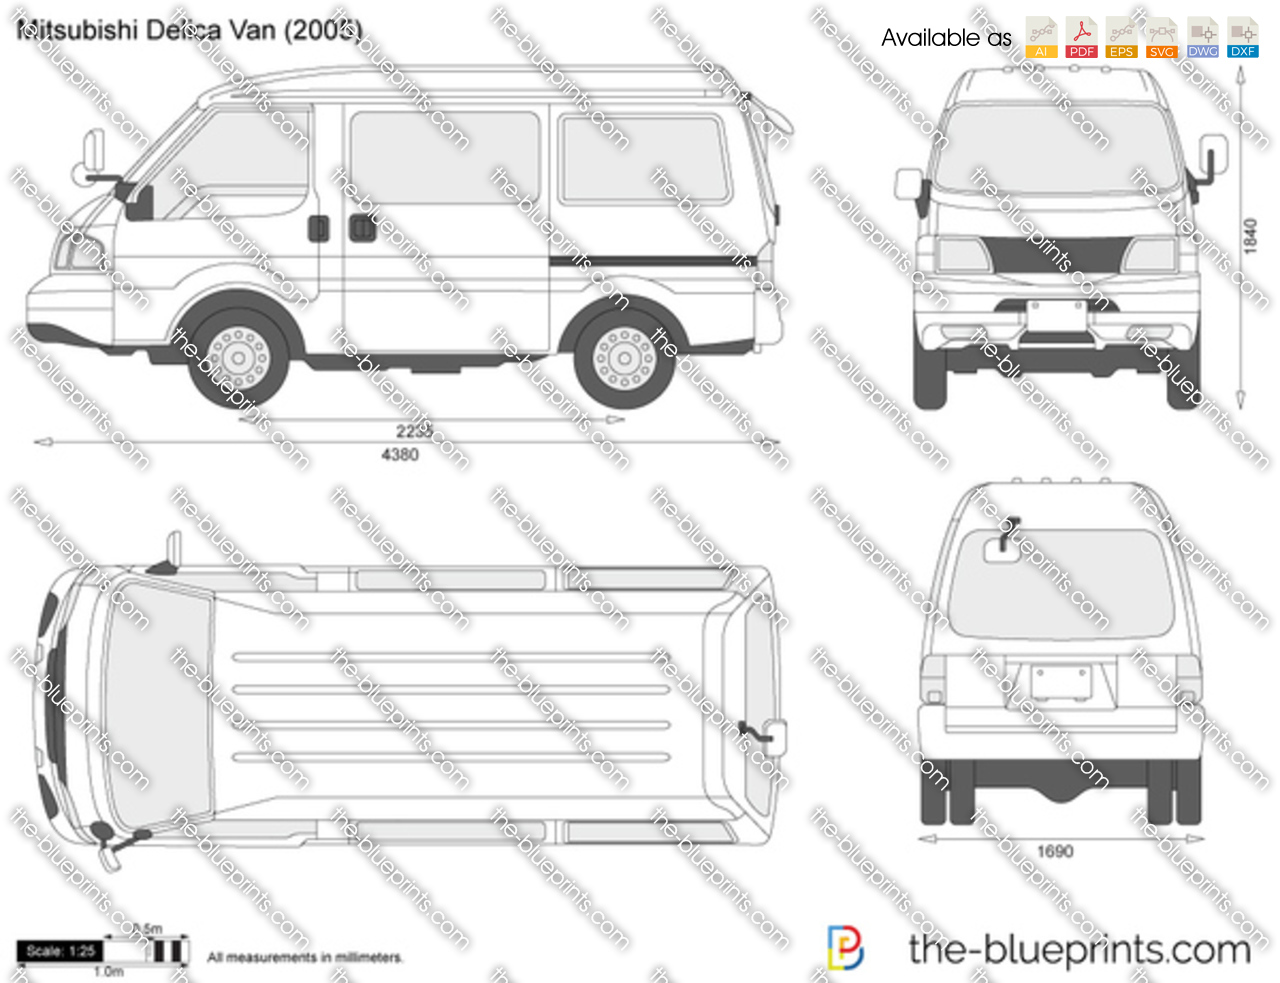 Mitsubishi Delica Van 2003